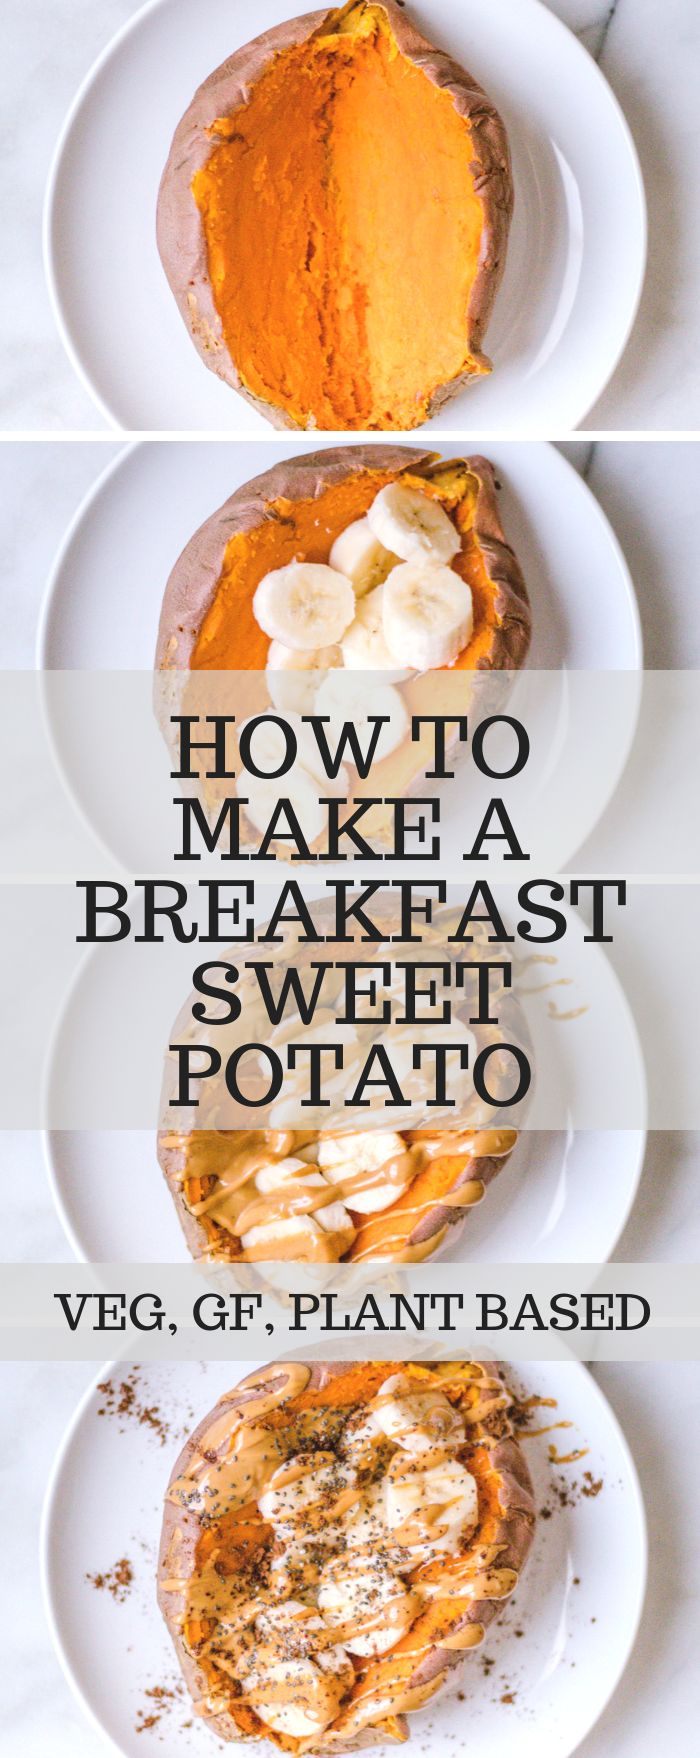 How To Make A Breakfast Sweet Potato